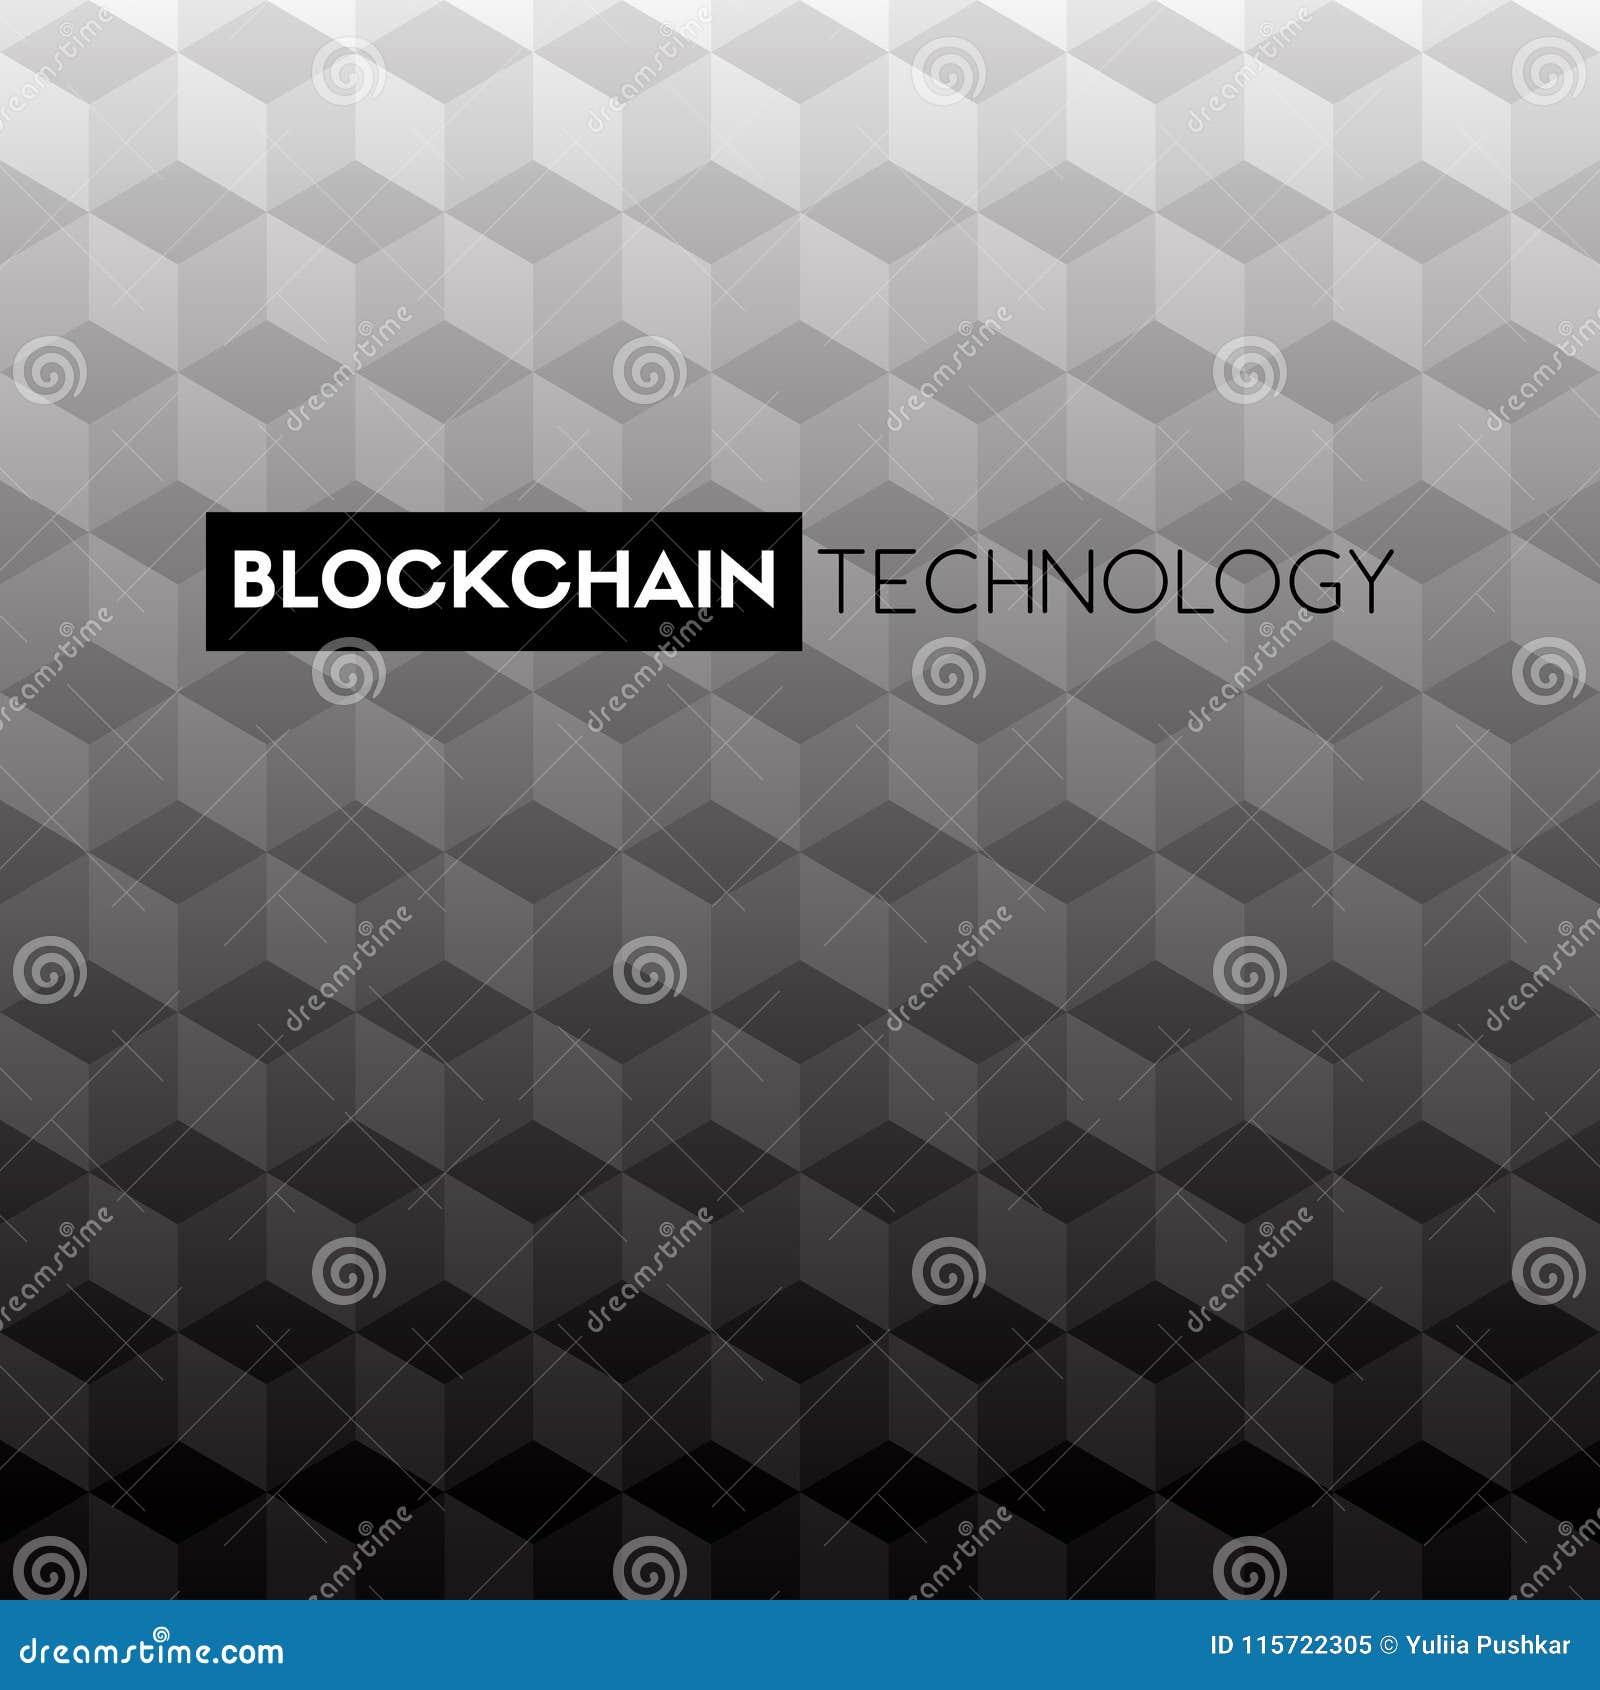 blockchain technology vector black and white background. Black Bedroom Furniture Sets. Home Design Ideas